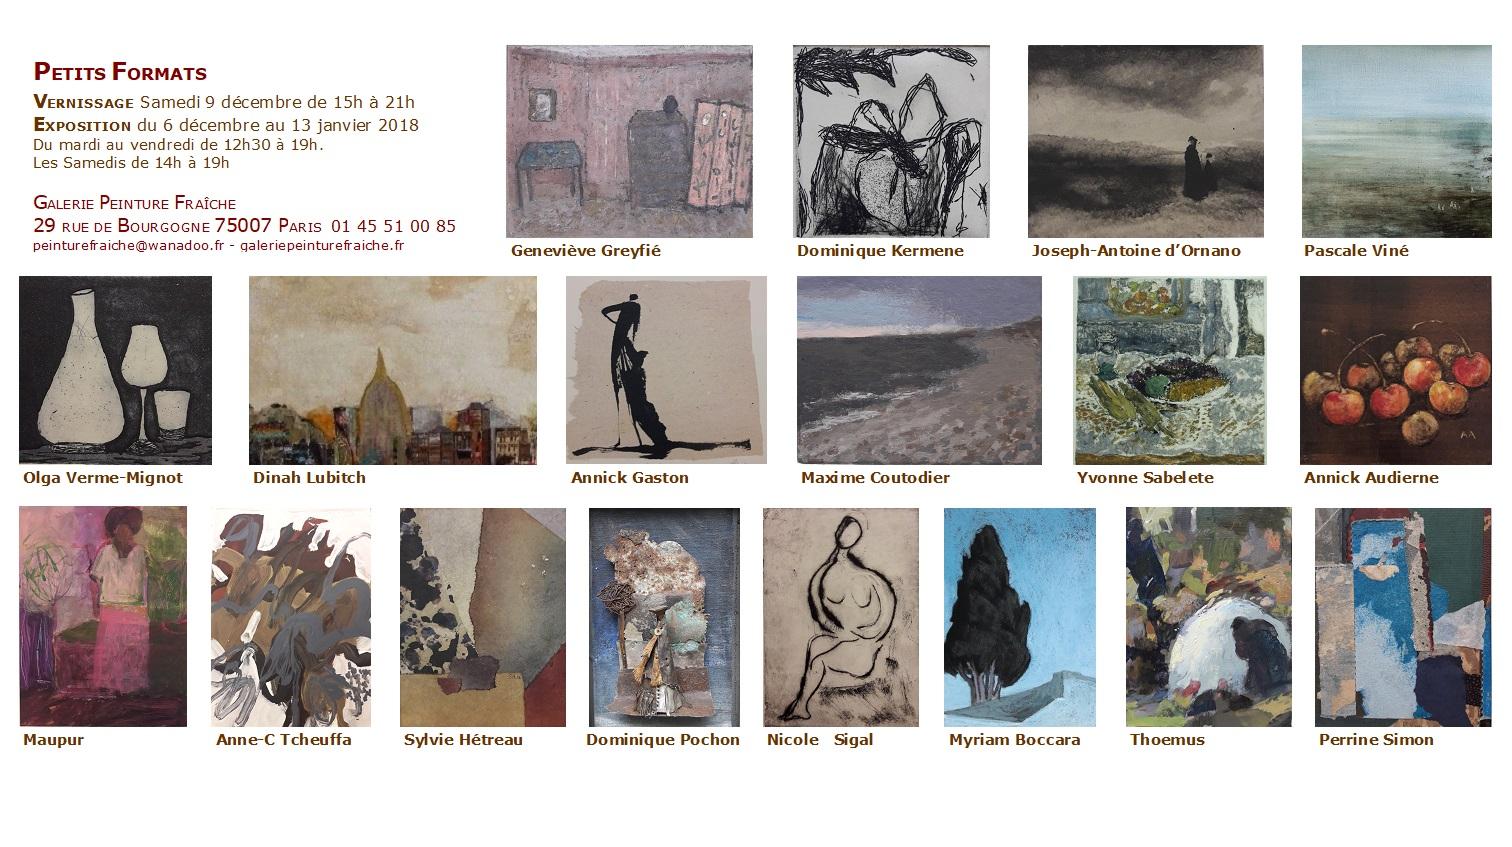 Exposition Peinture Fraiche